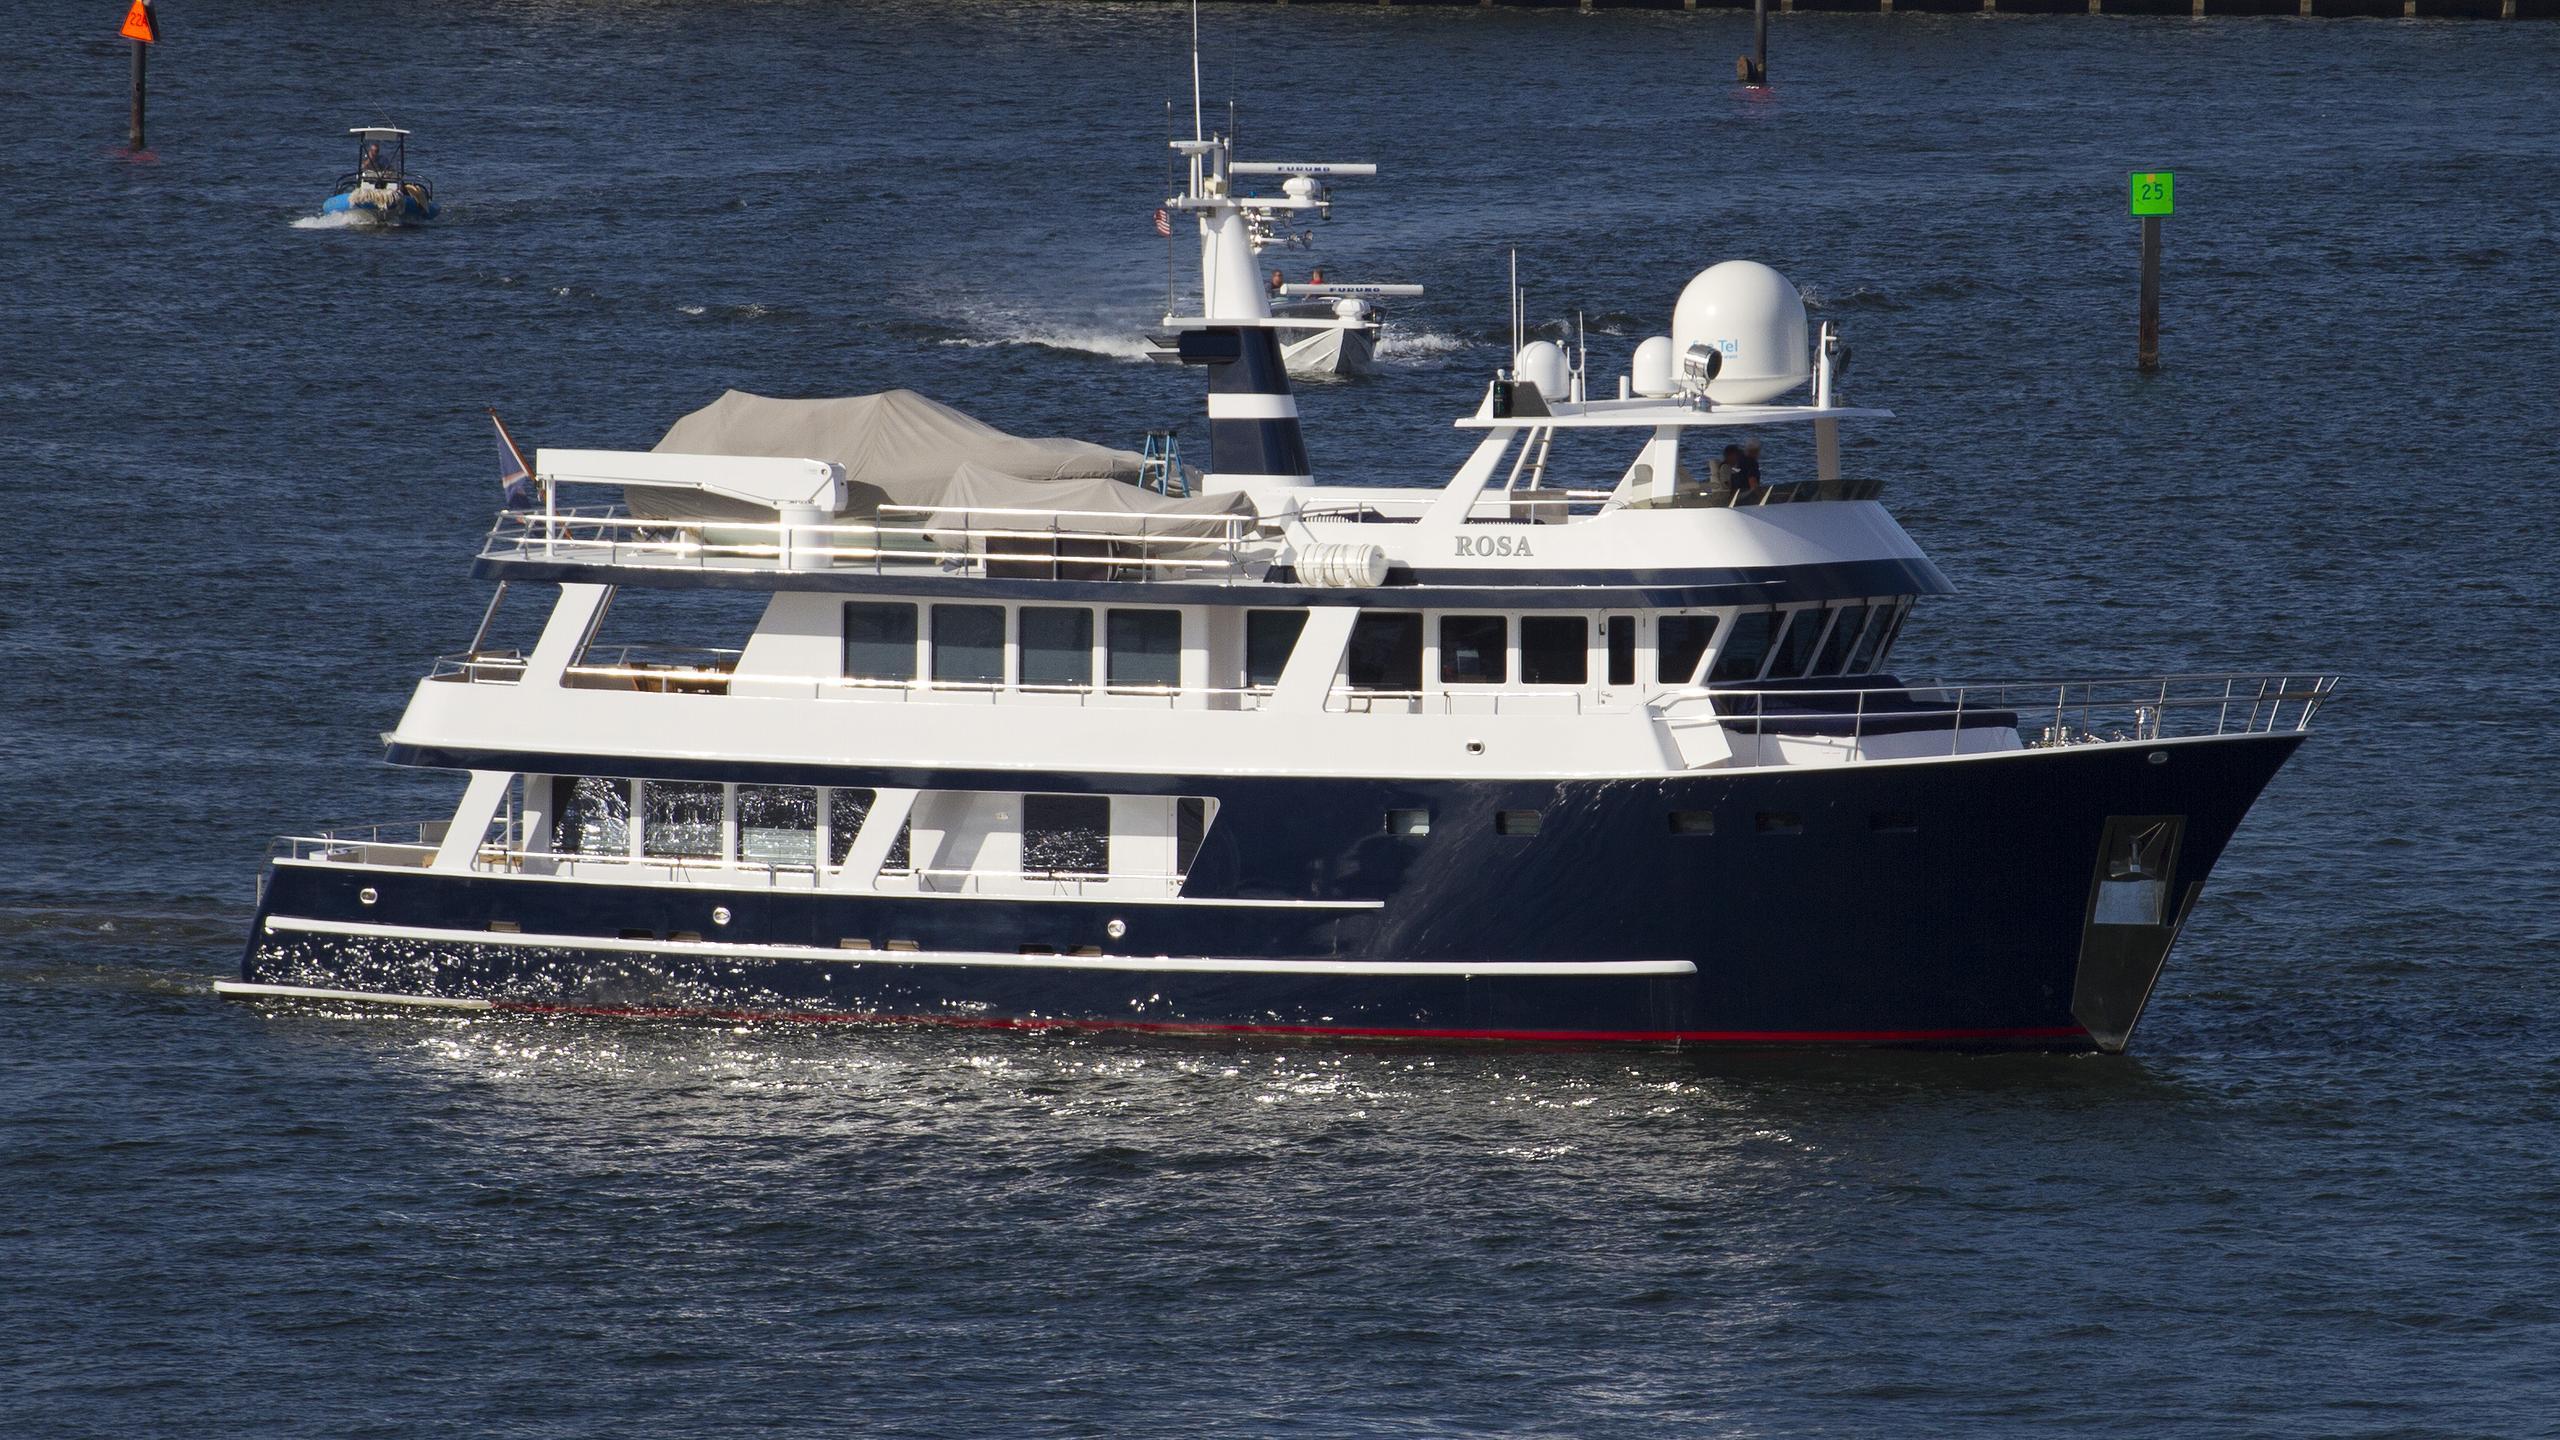 abd-aluminium-rosa-1996-expedition-motor-yacht-running